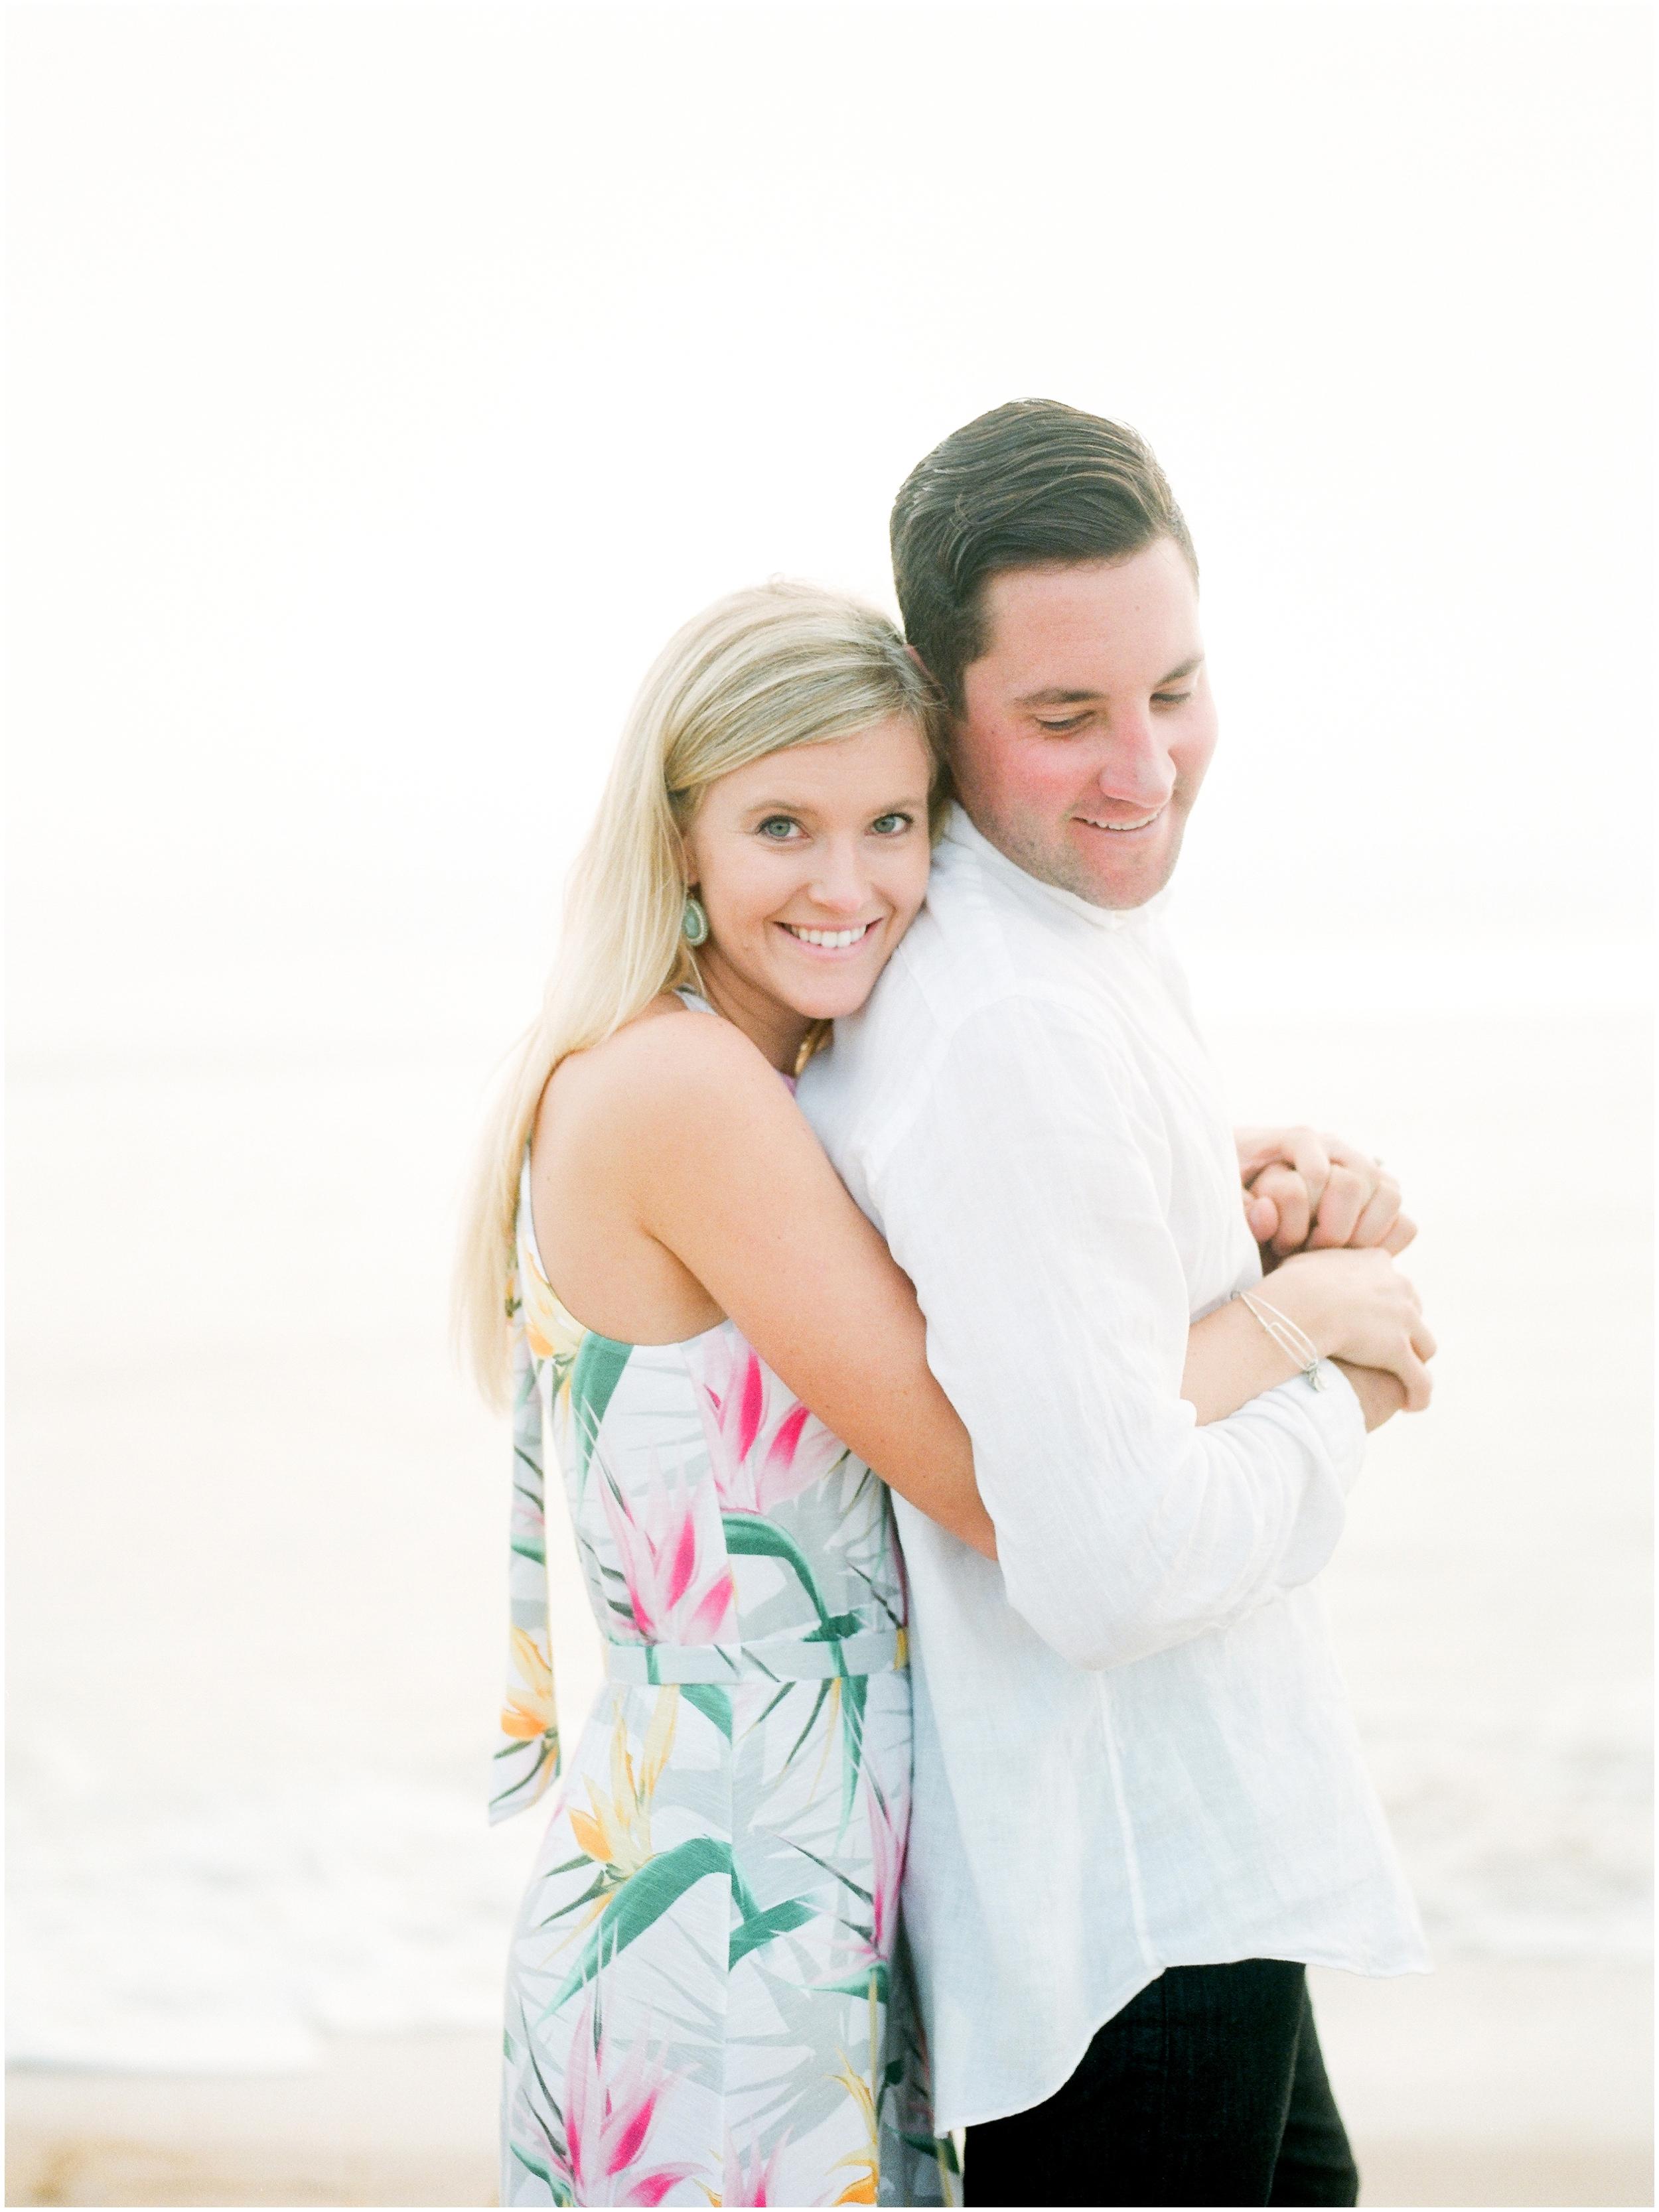 Sunrise Engagement Session at Vilano Beach- Jacksonville, Florida Fine Art Film Wedding Photography_0049.jpg